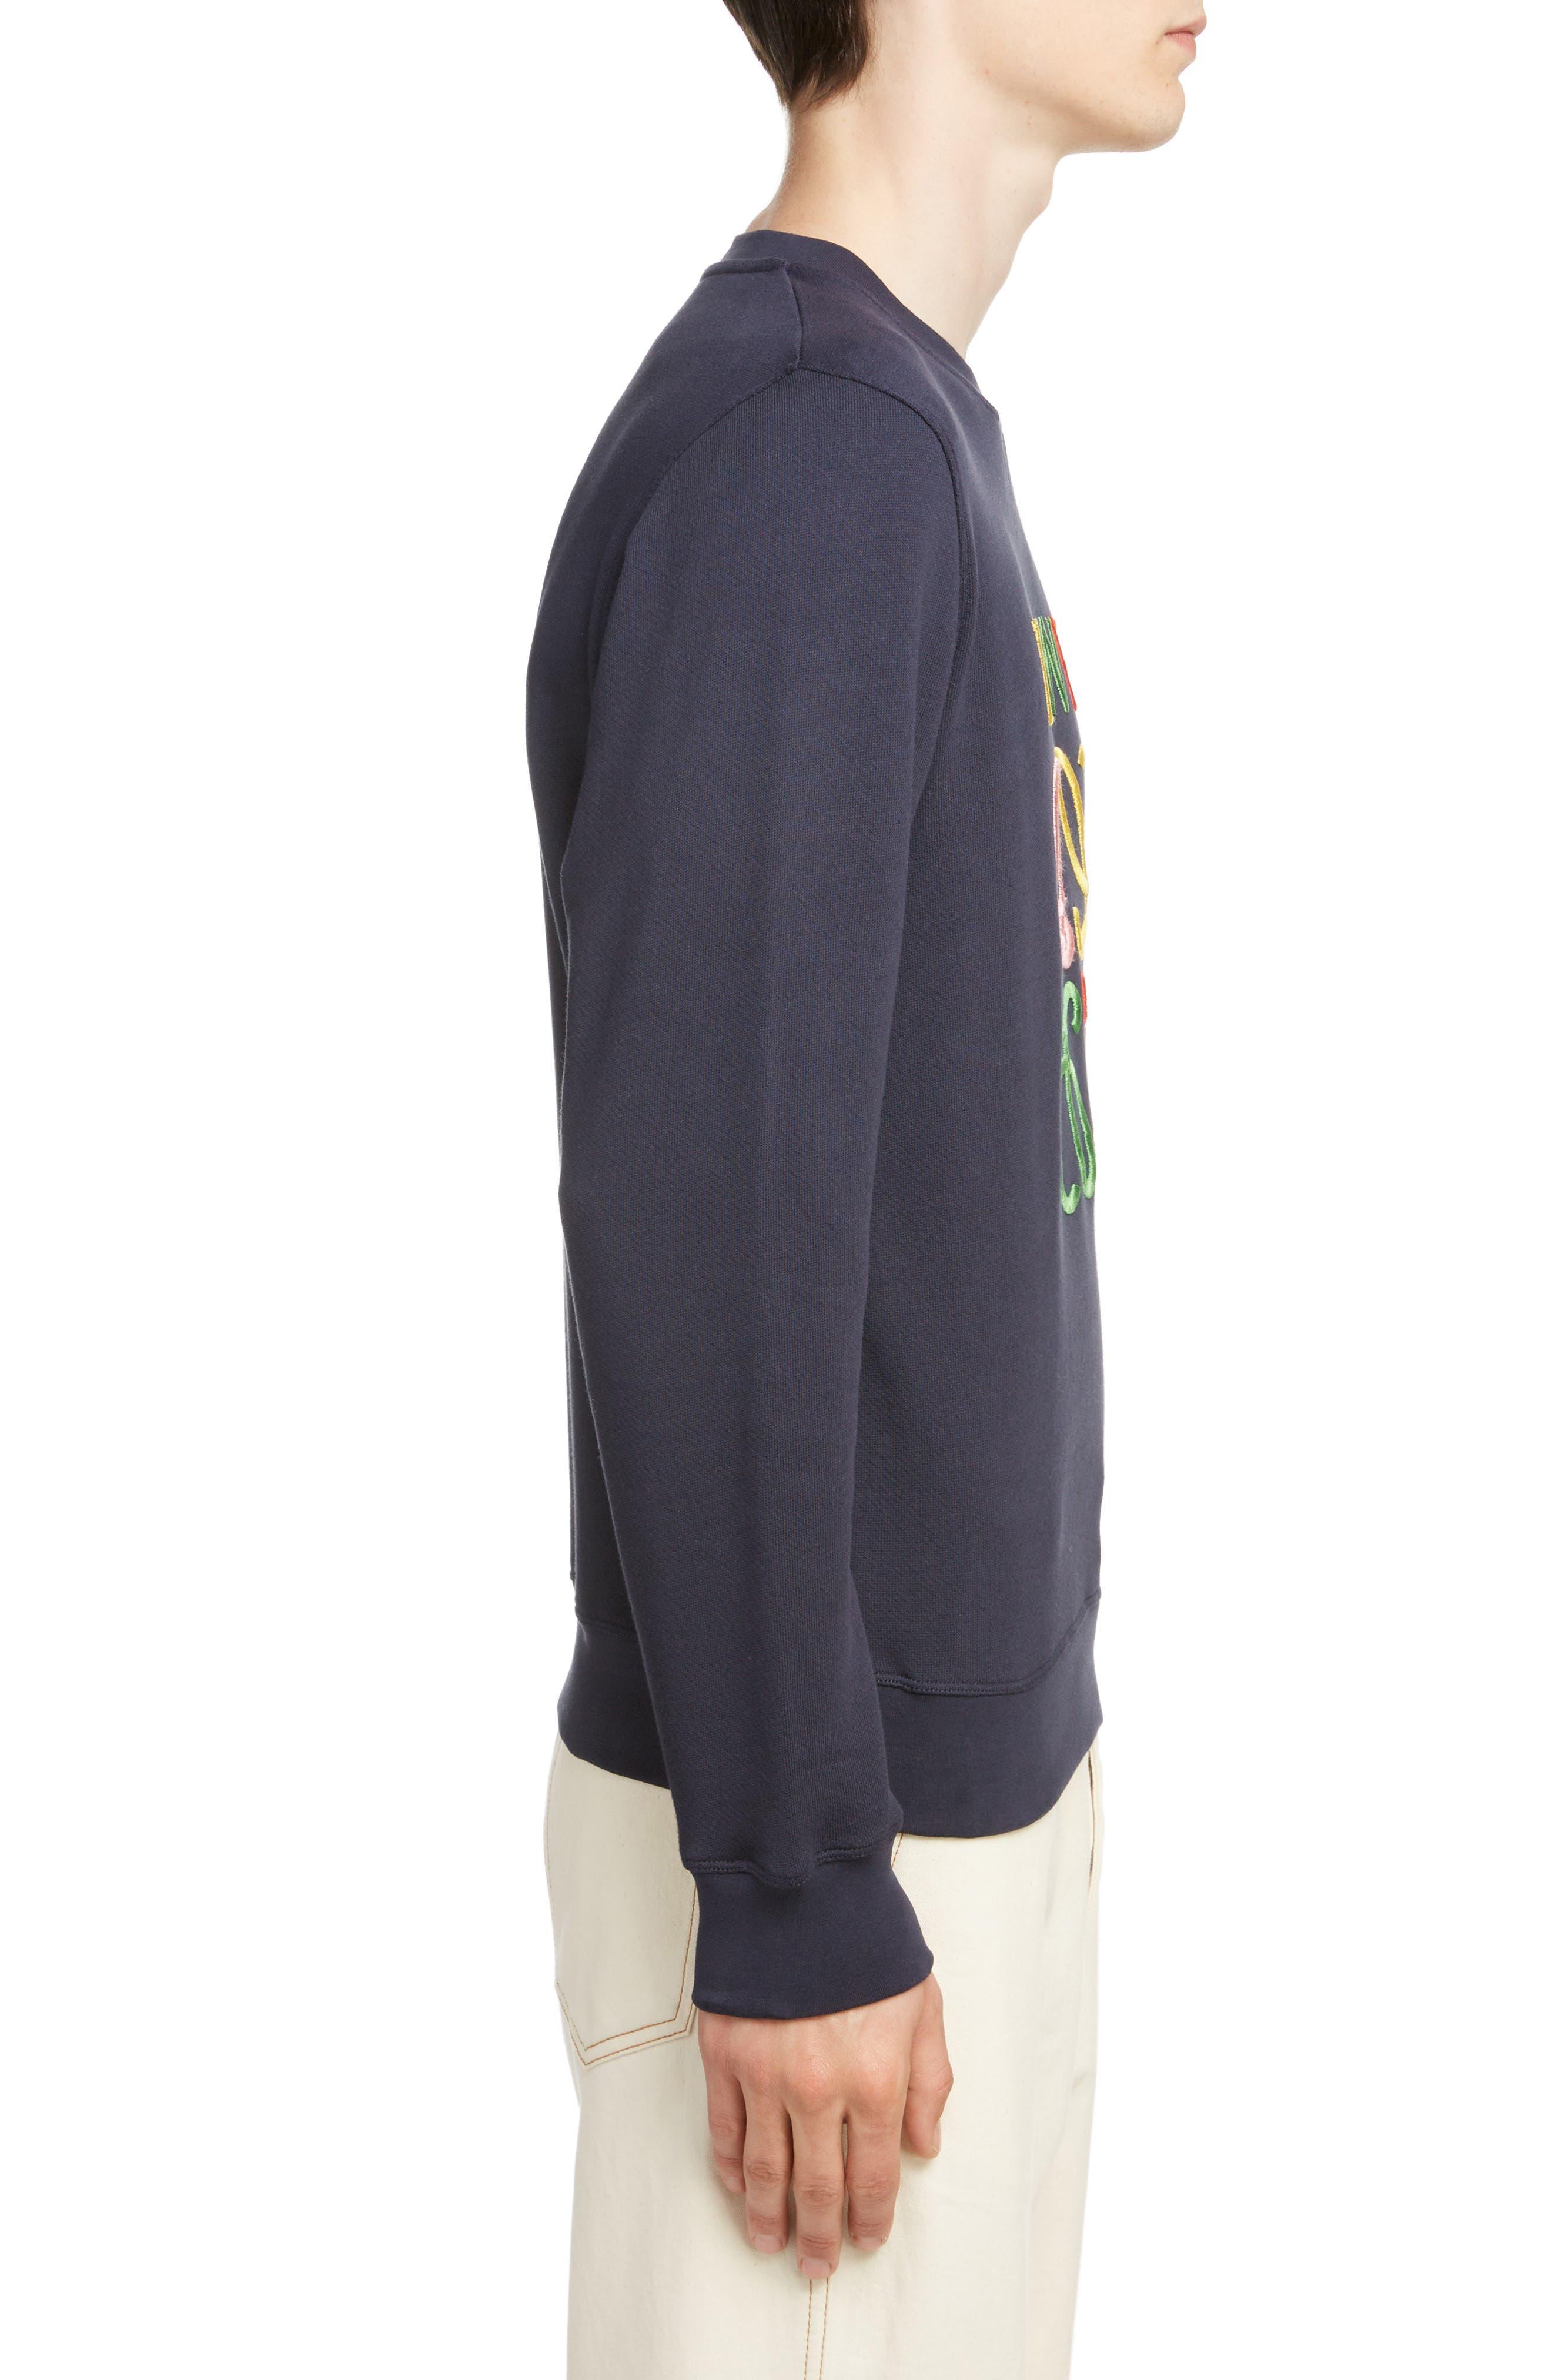 Anagram Sweatshirt,                             Alternate thumbnail 3, color,                             5387-NAVY BLUE/ MULTICOLOR